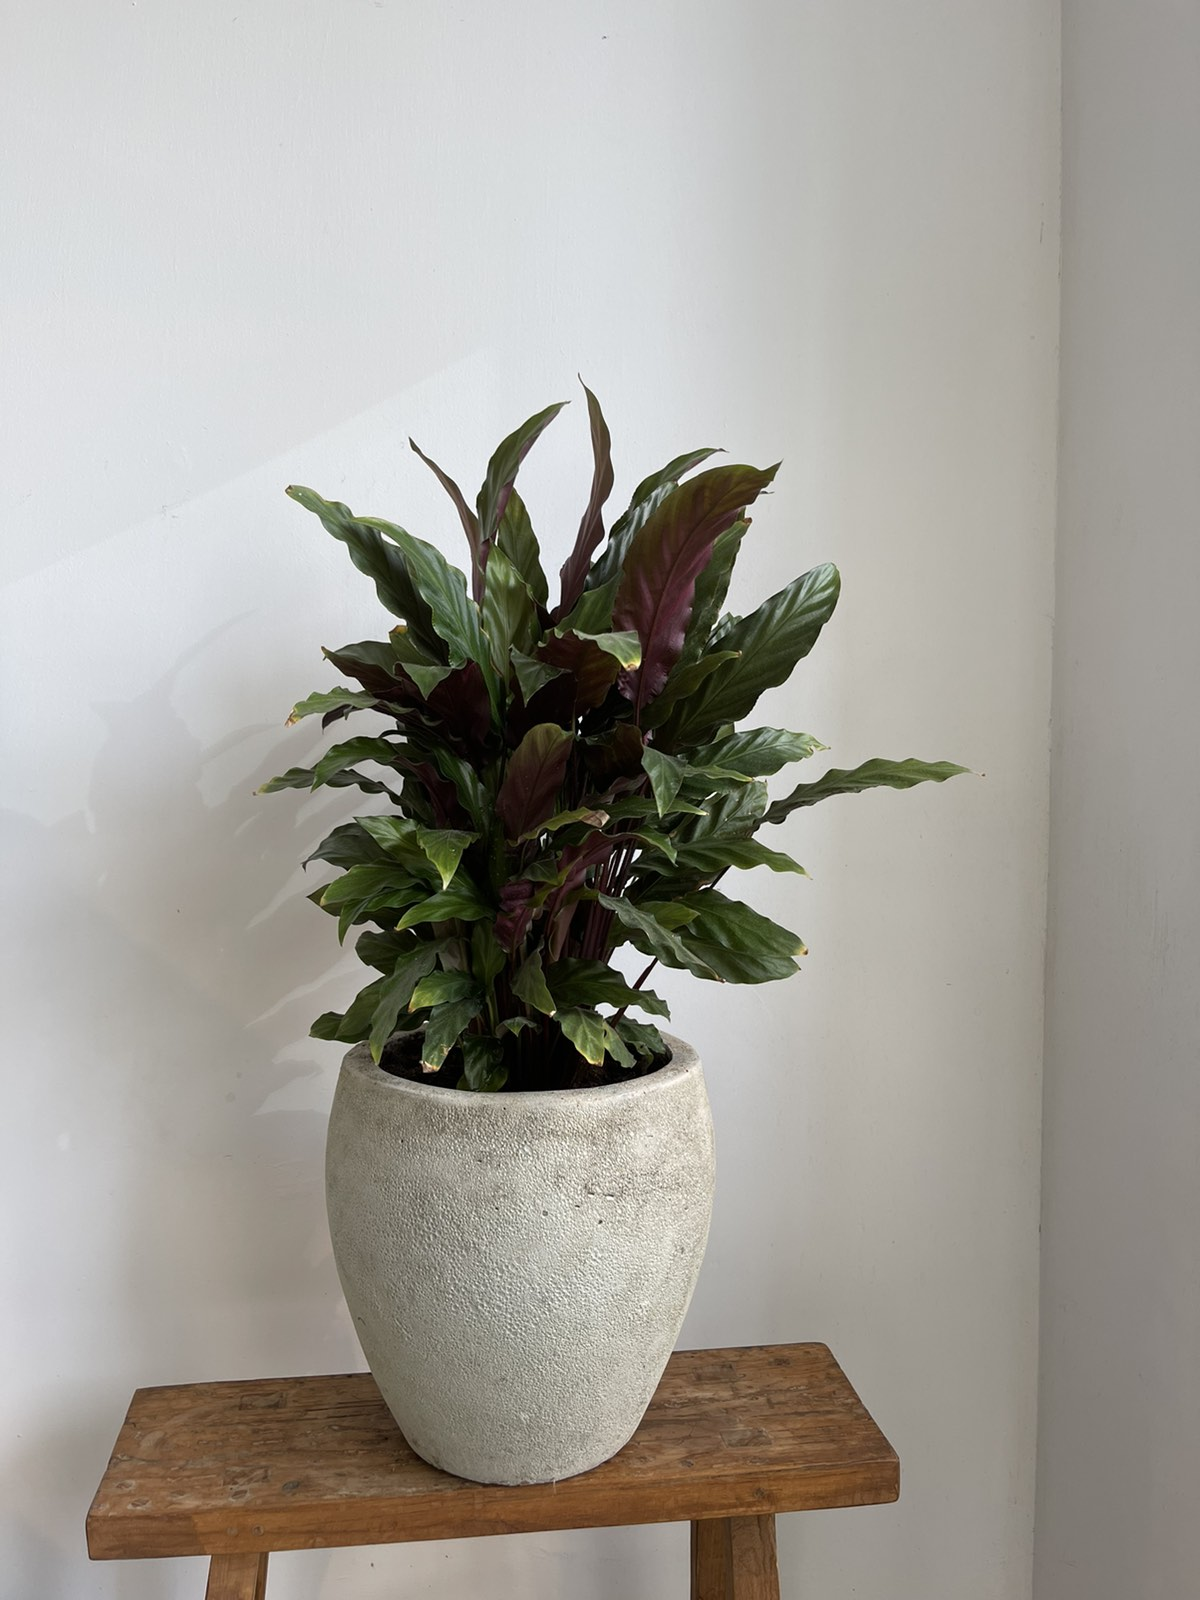 Calathea in grey ceramic pot